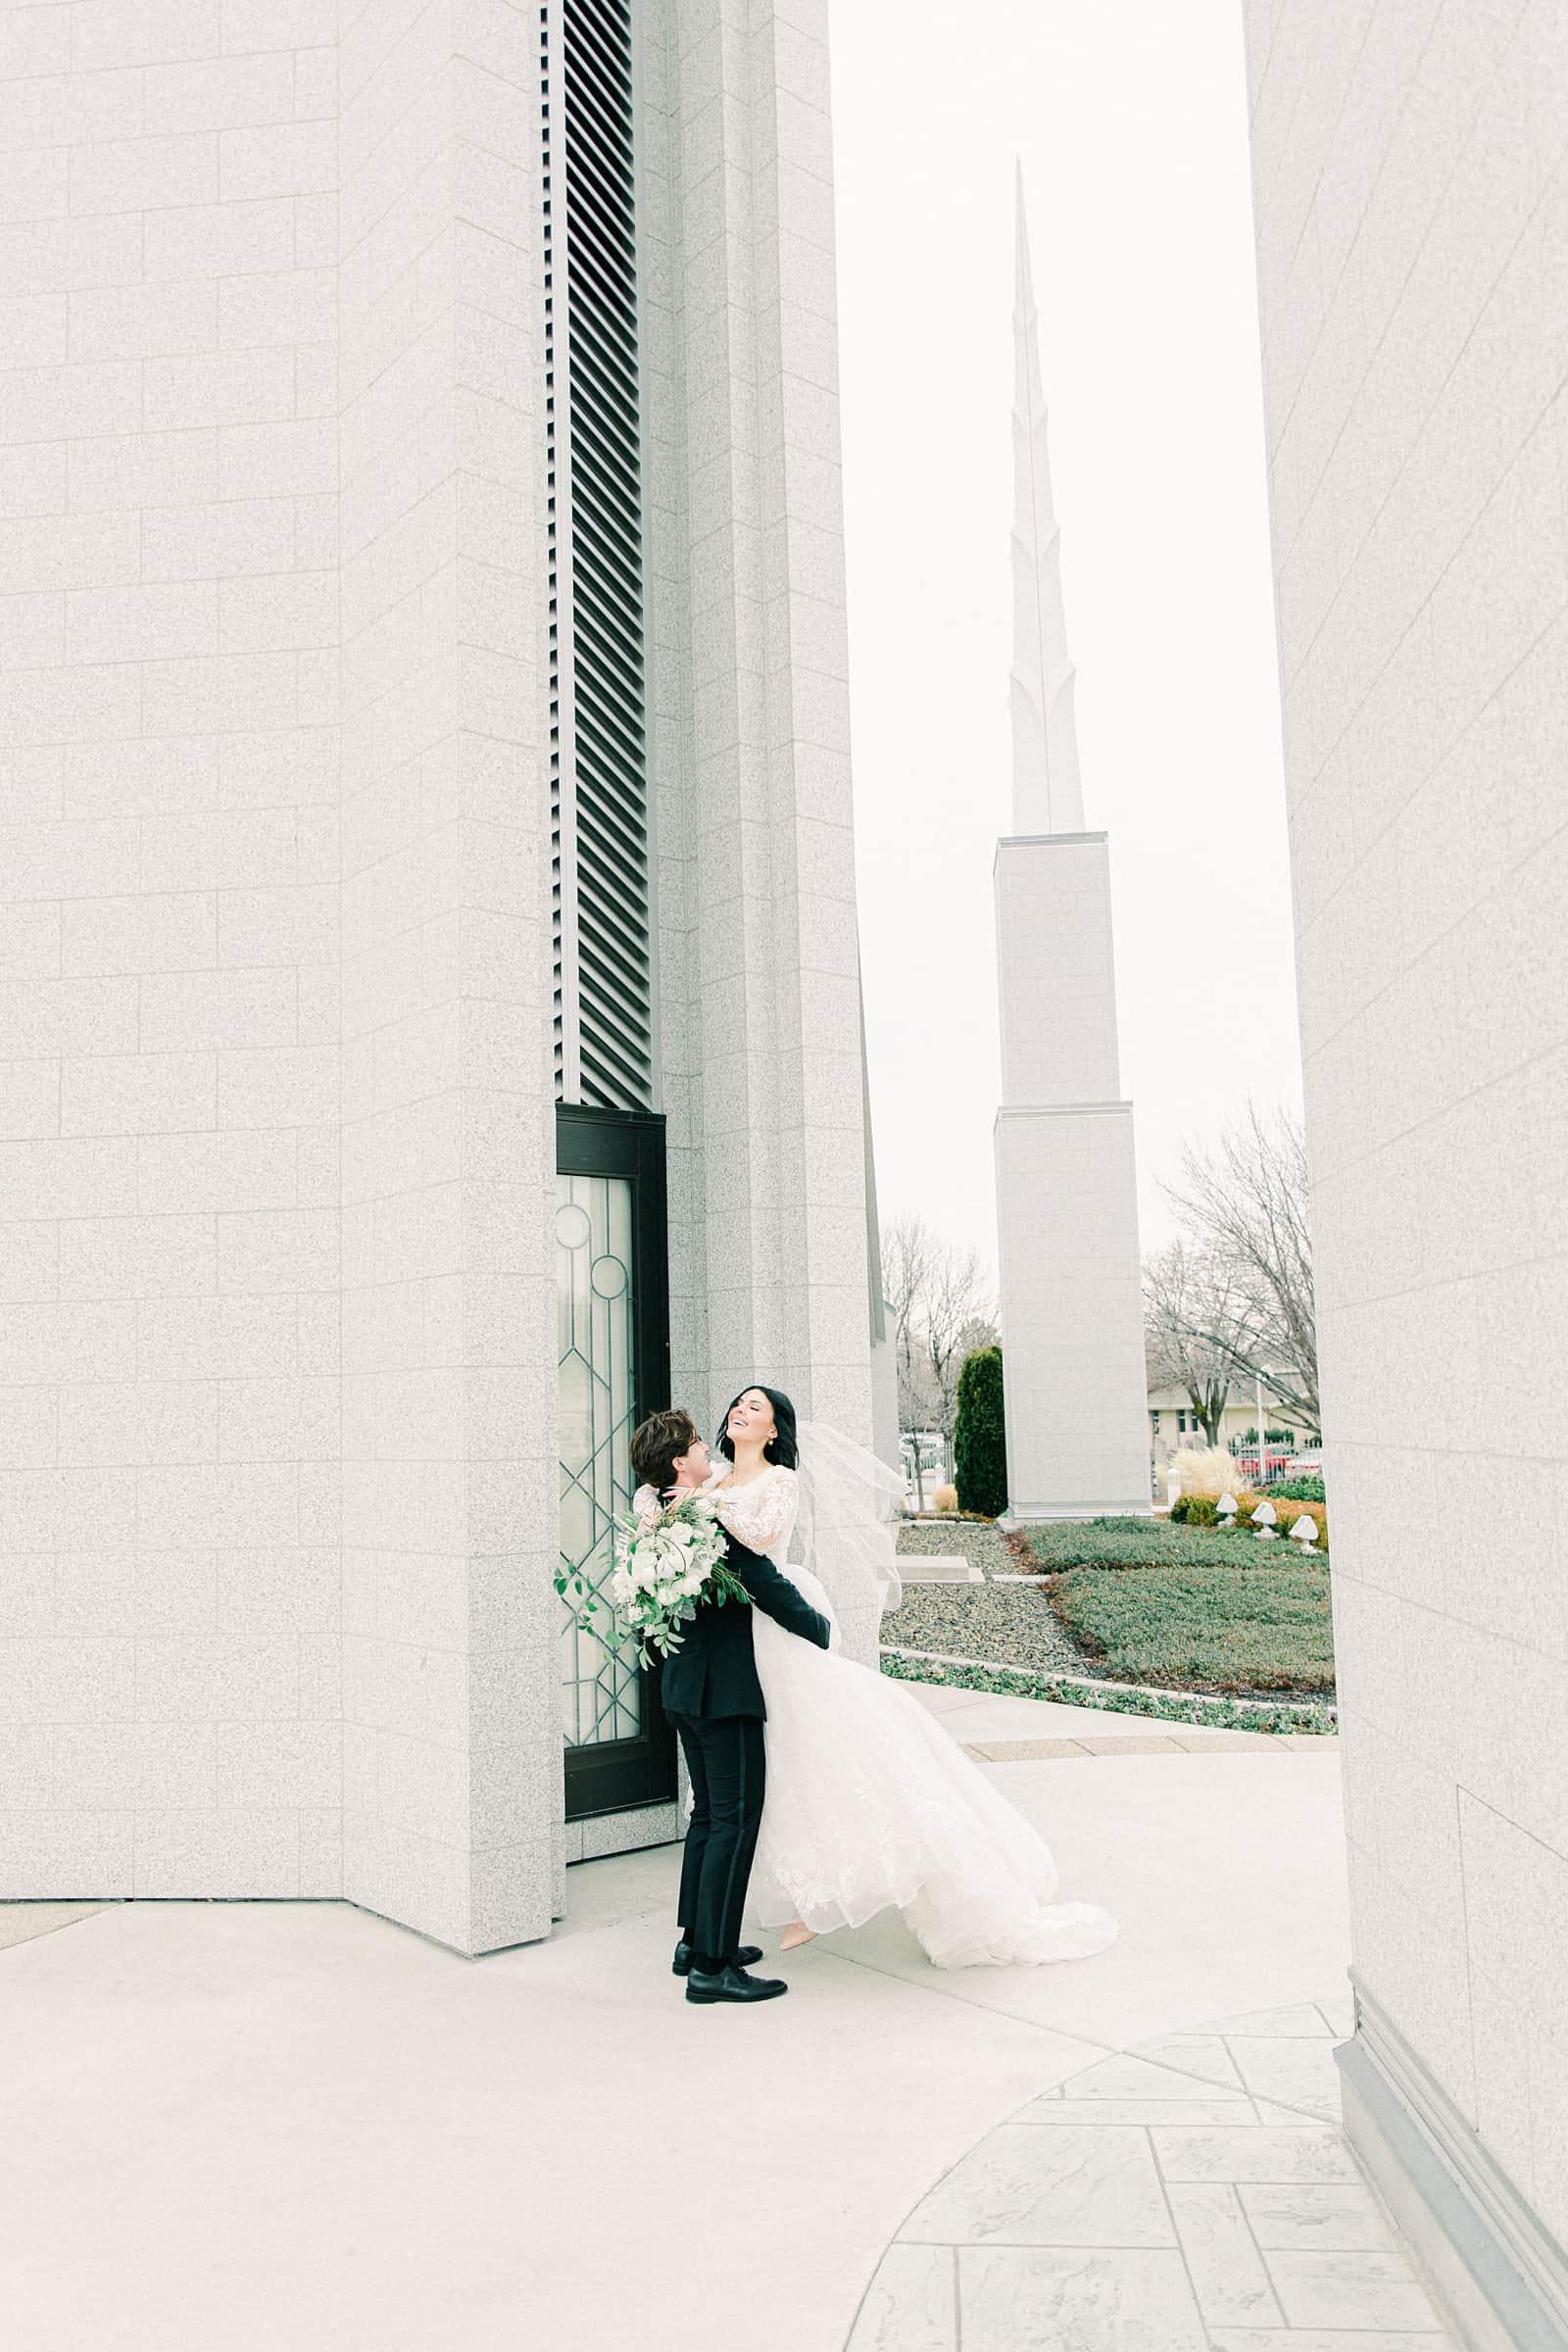 Cute bride and groom pose, utah wedding photography